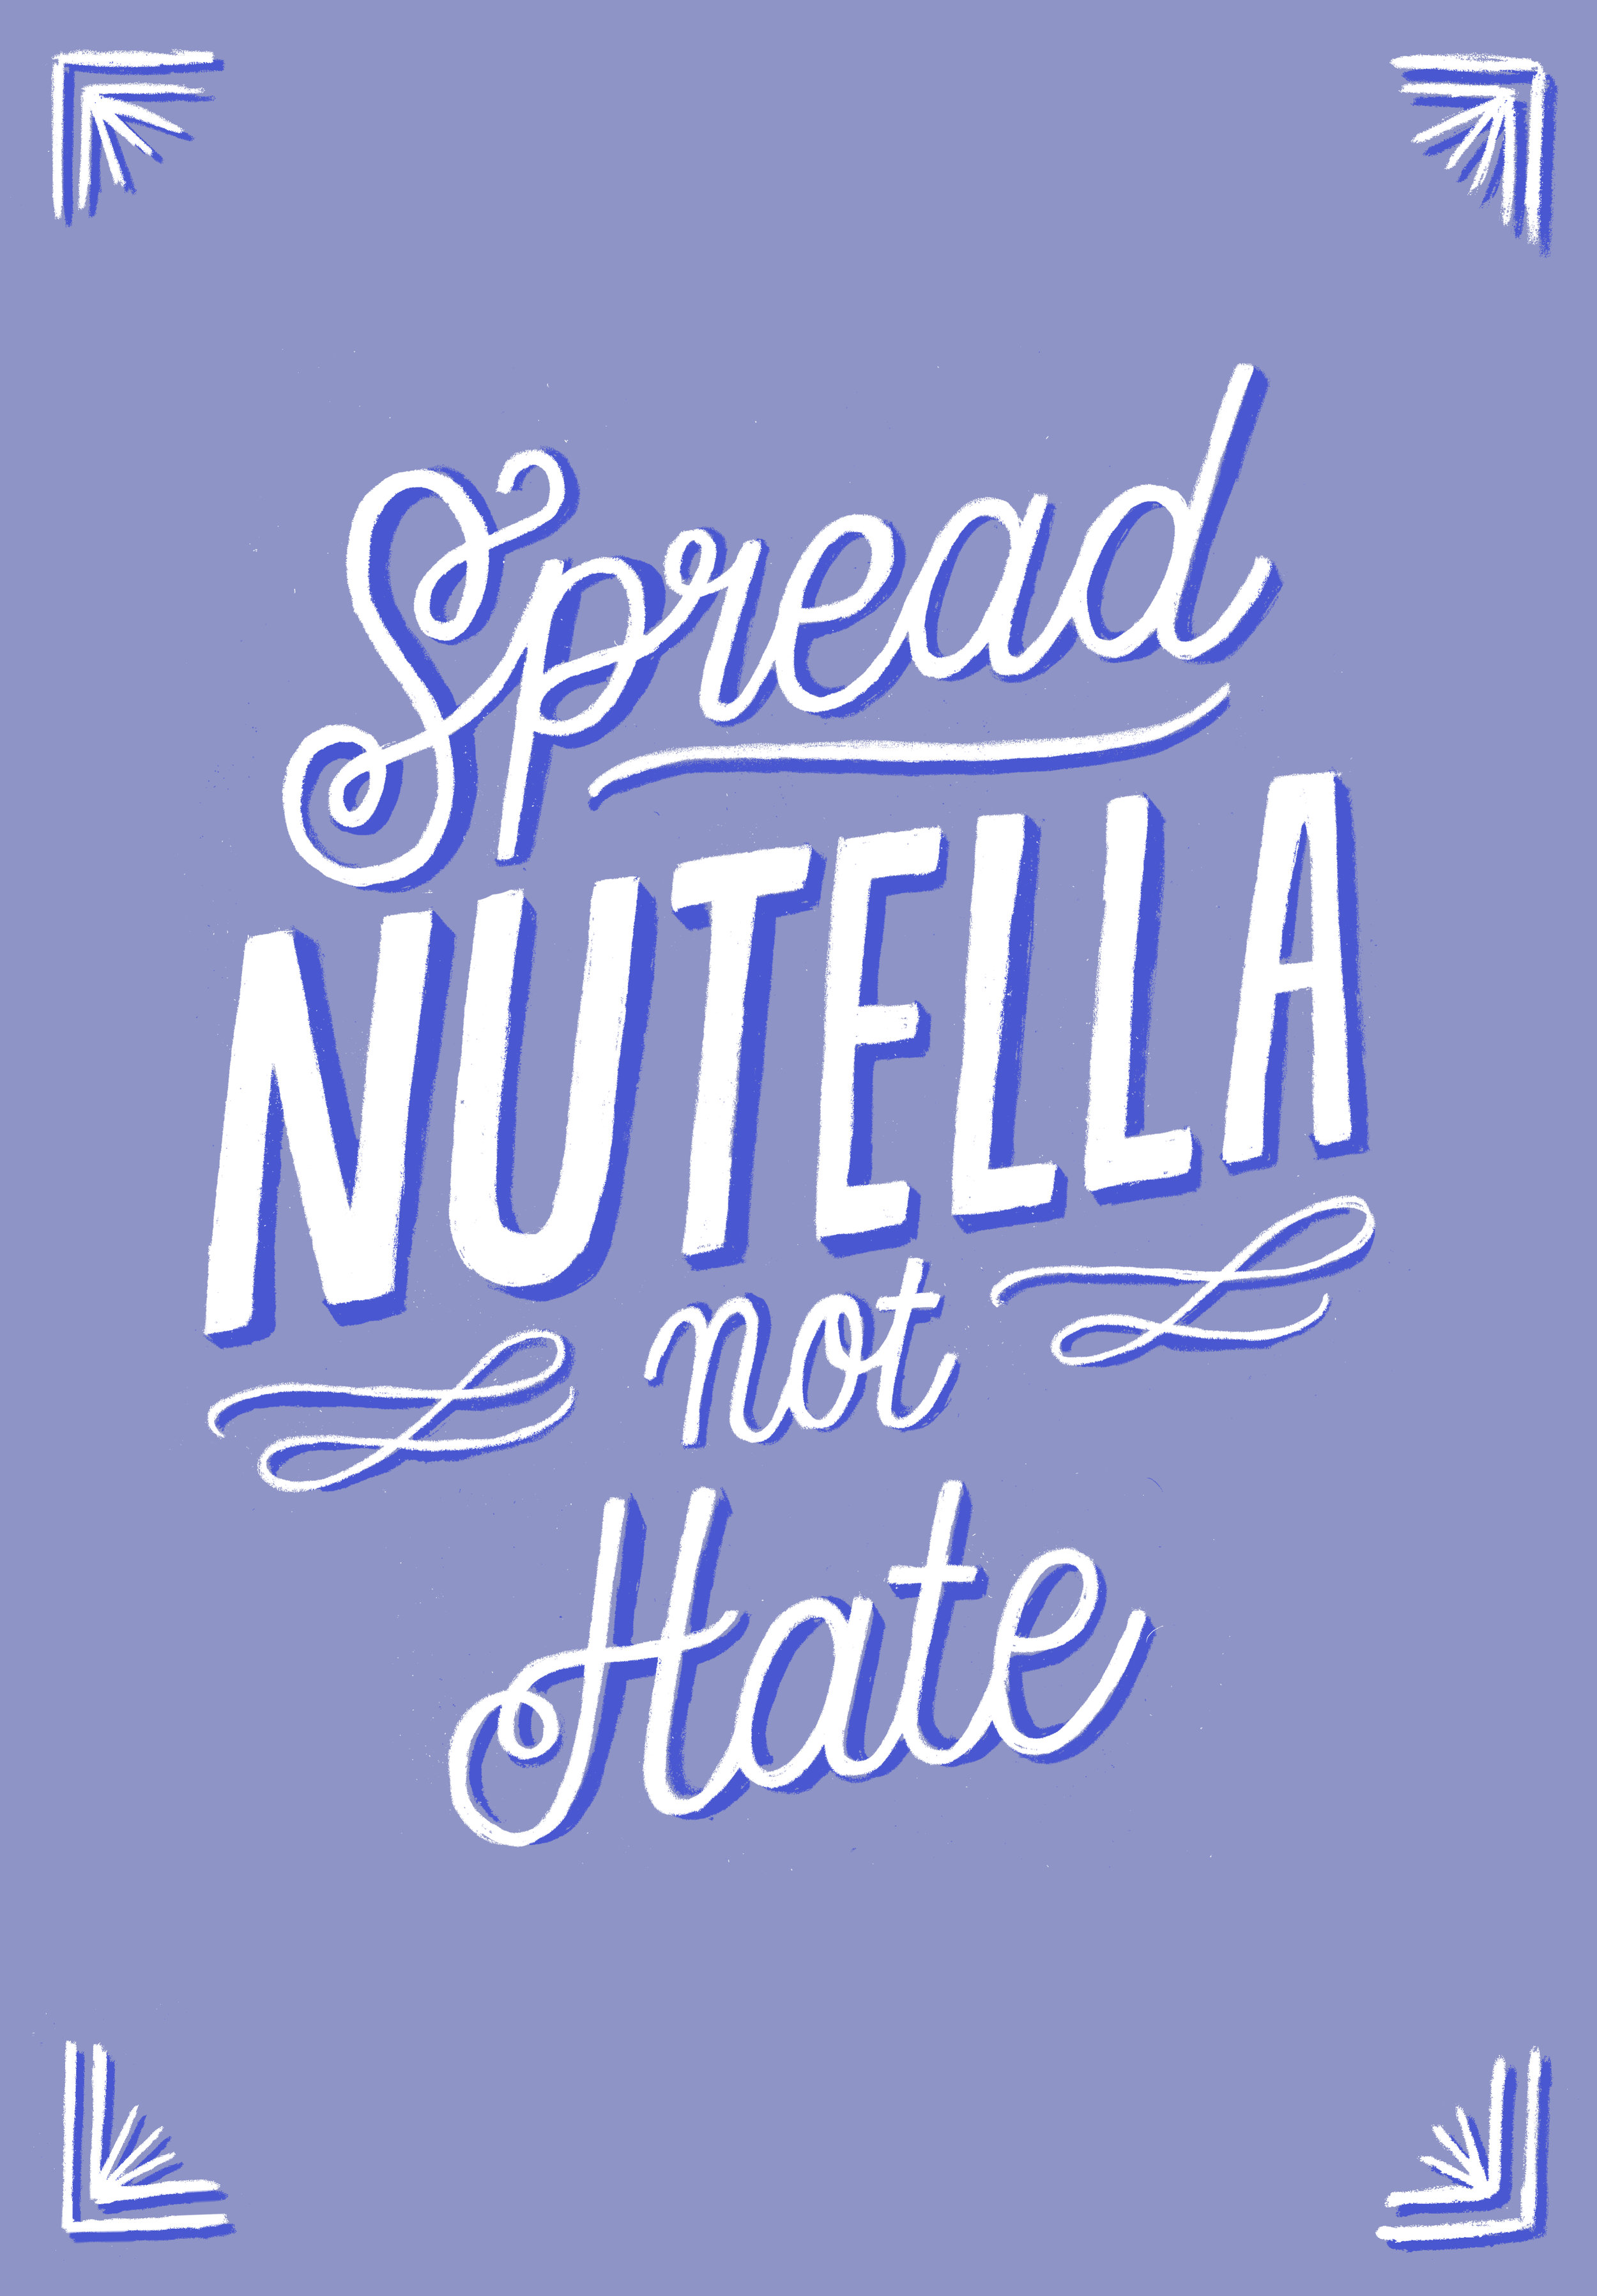 Spread Nutella.jpg